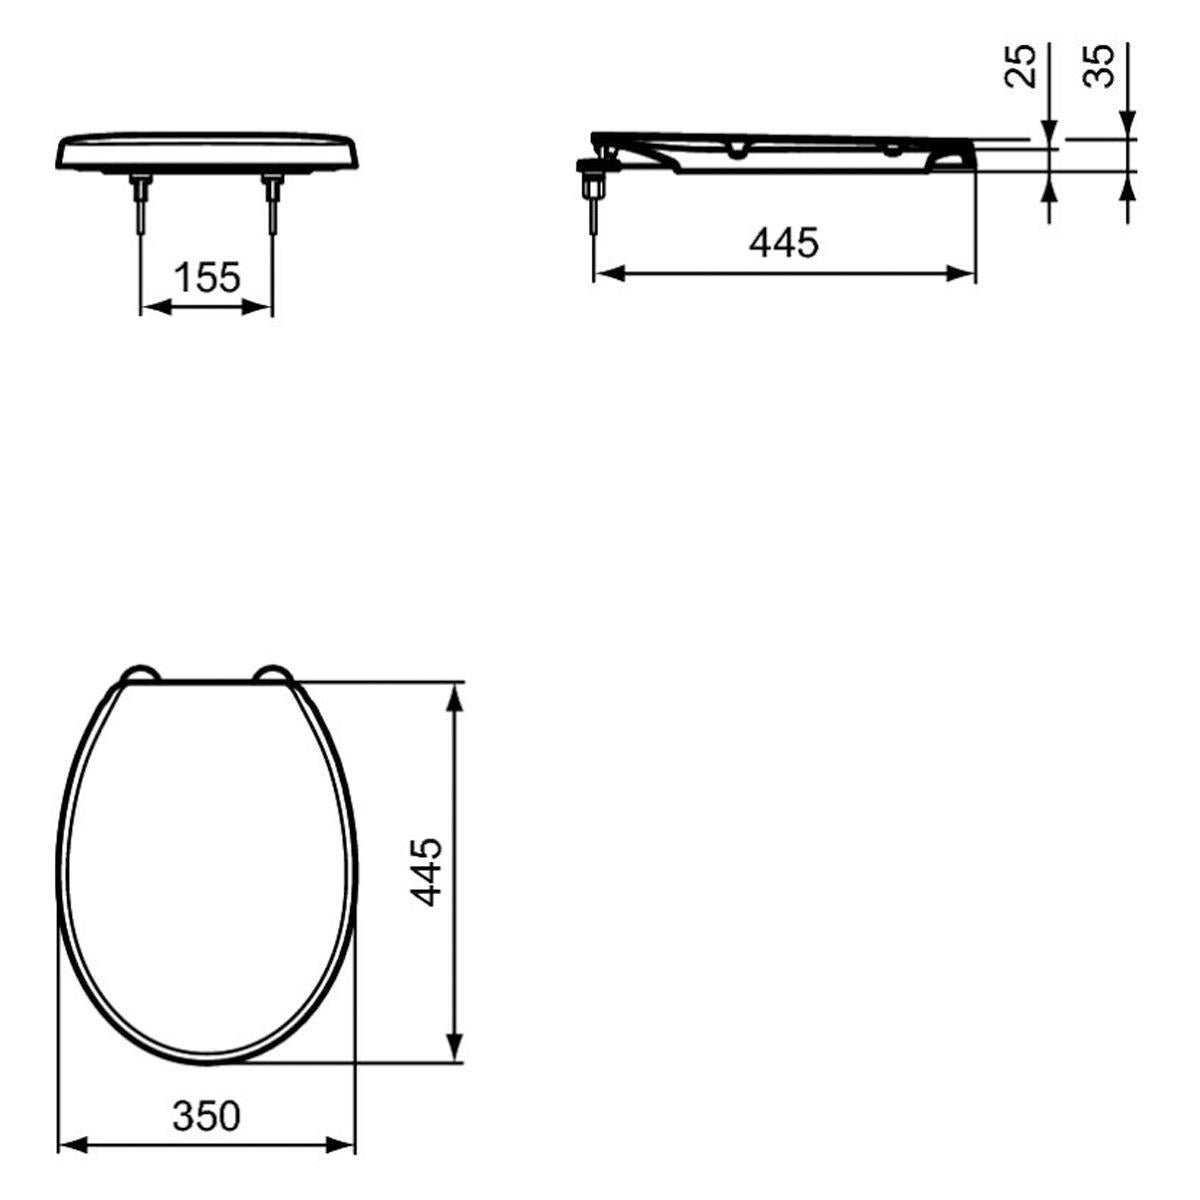 Copriwater ovale Originale per serie sanitari Idyl IDEAL STANDARD termoindurente bianco - 2